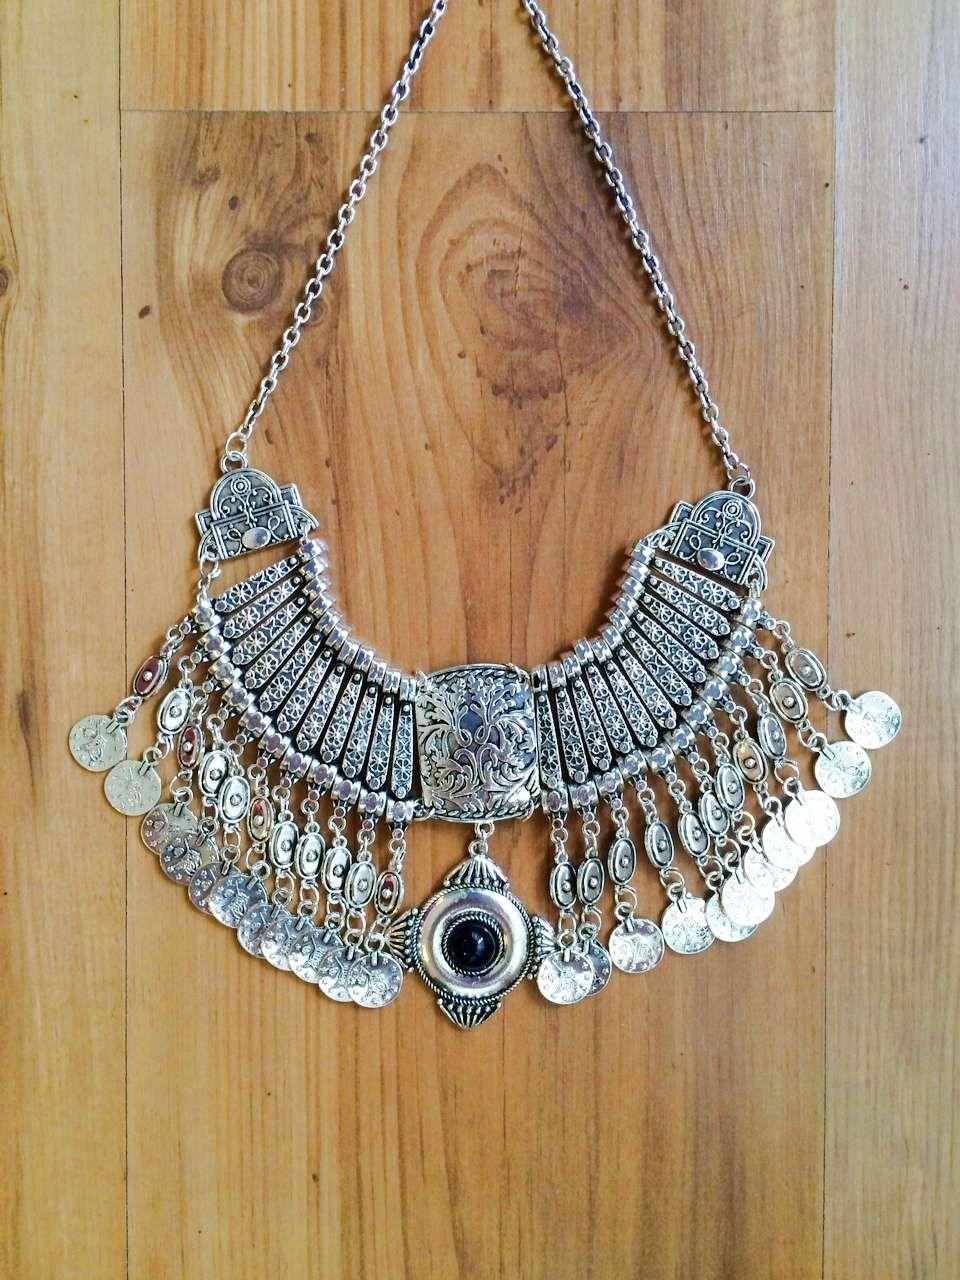 6636318b6 Maxi colar prata turco moedas - estilo gypsy | Gypsy in me | Jewelry ...